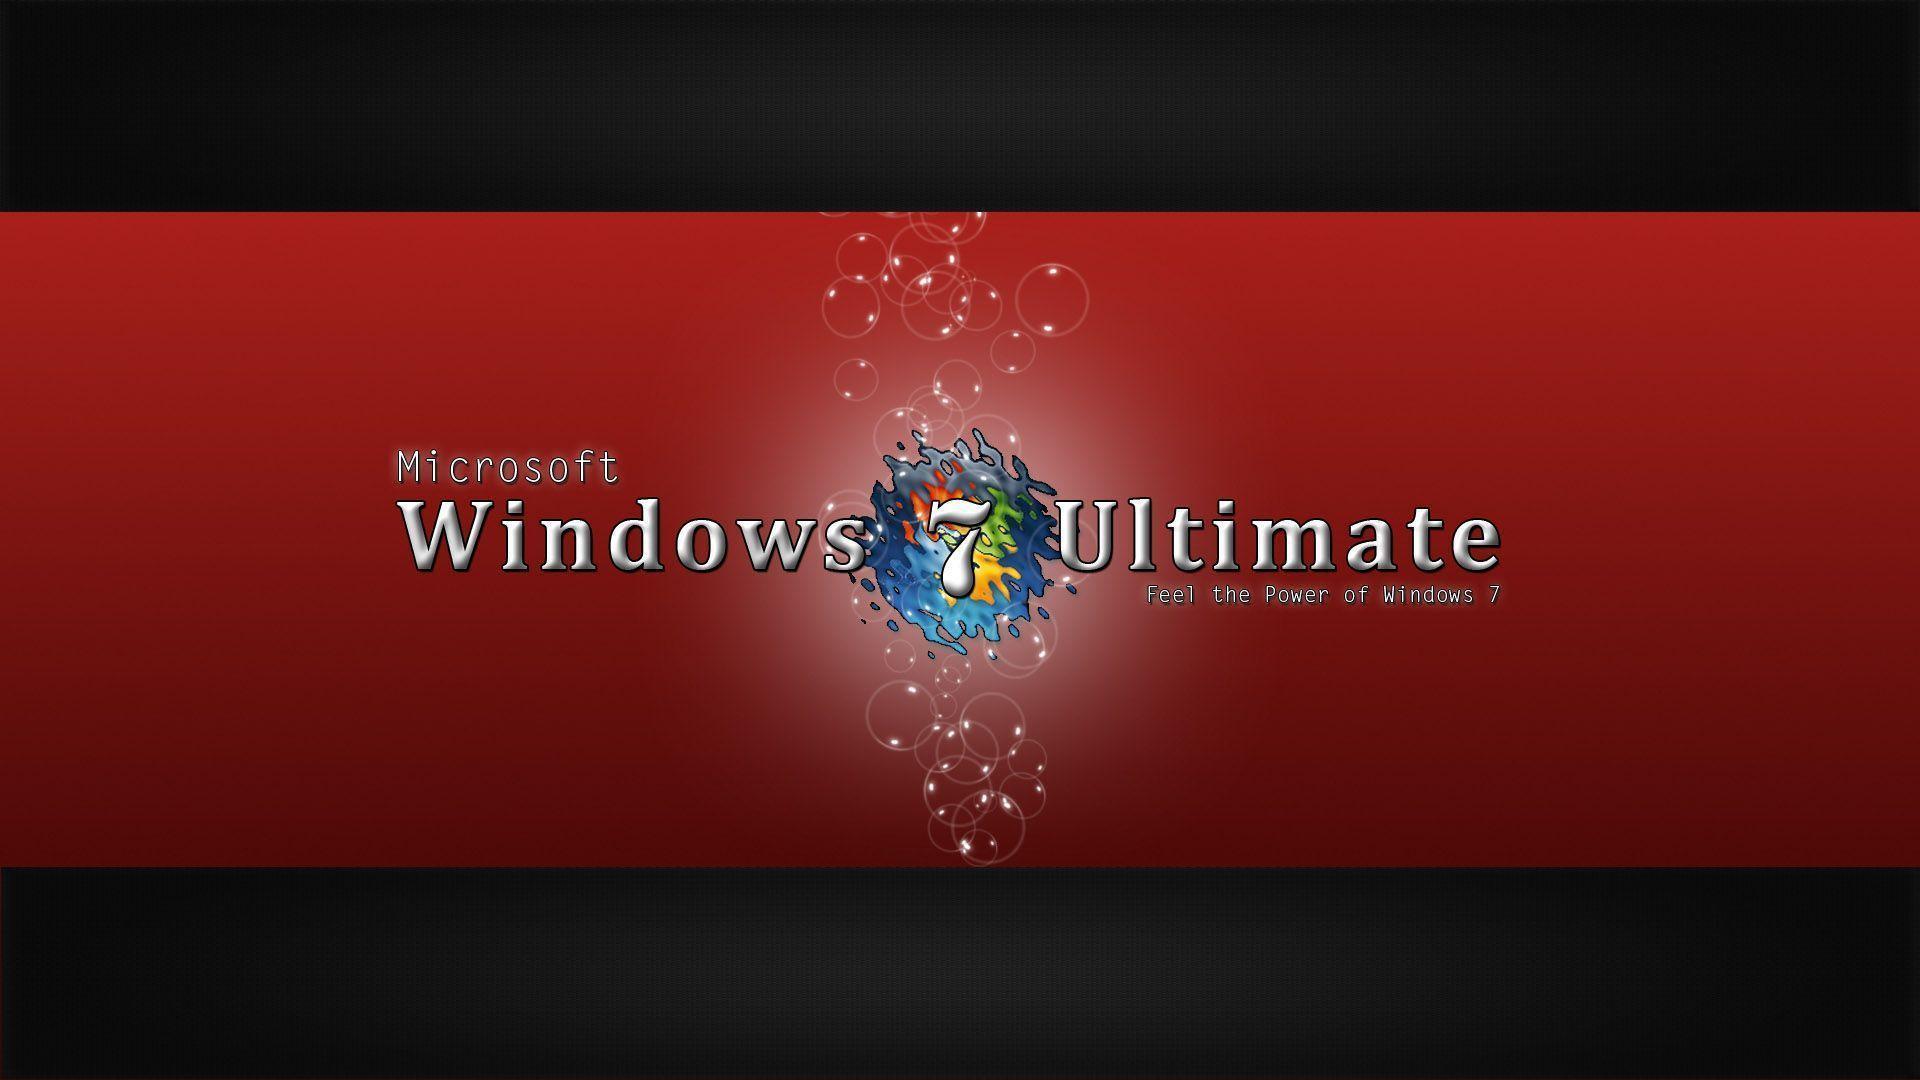 Windows 7 Ultimate Desktop Backgrounds